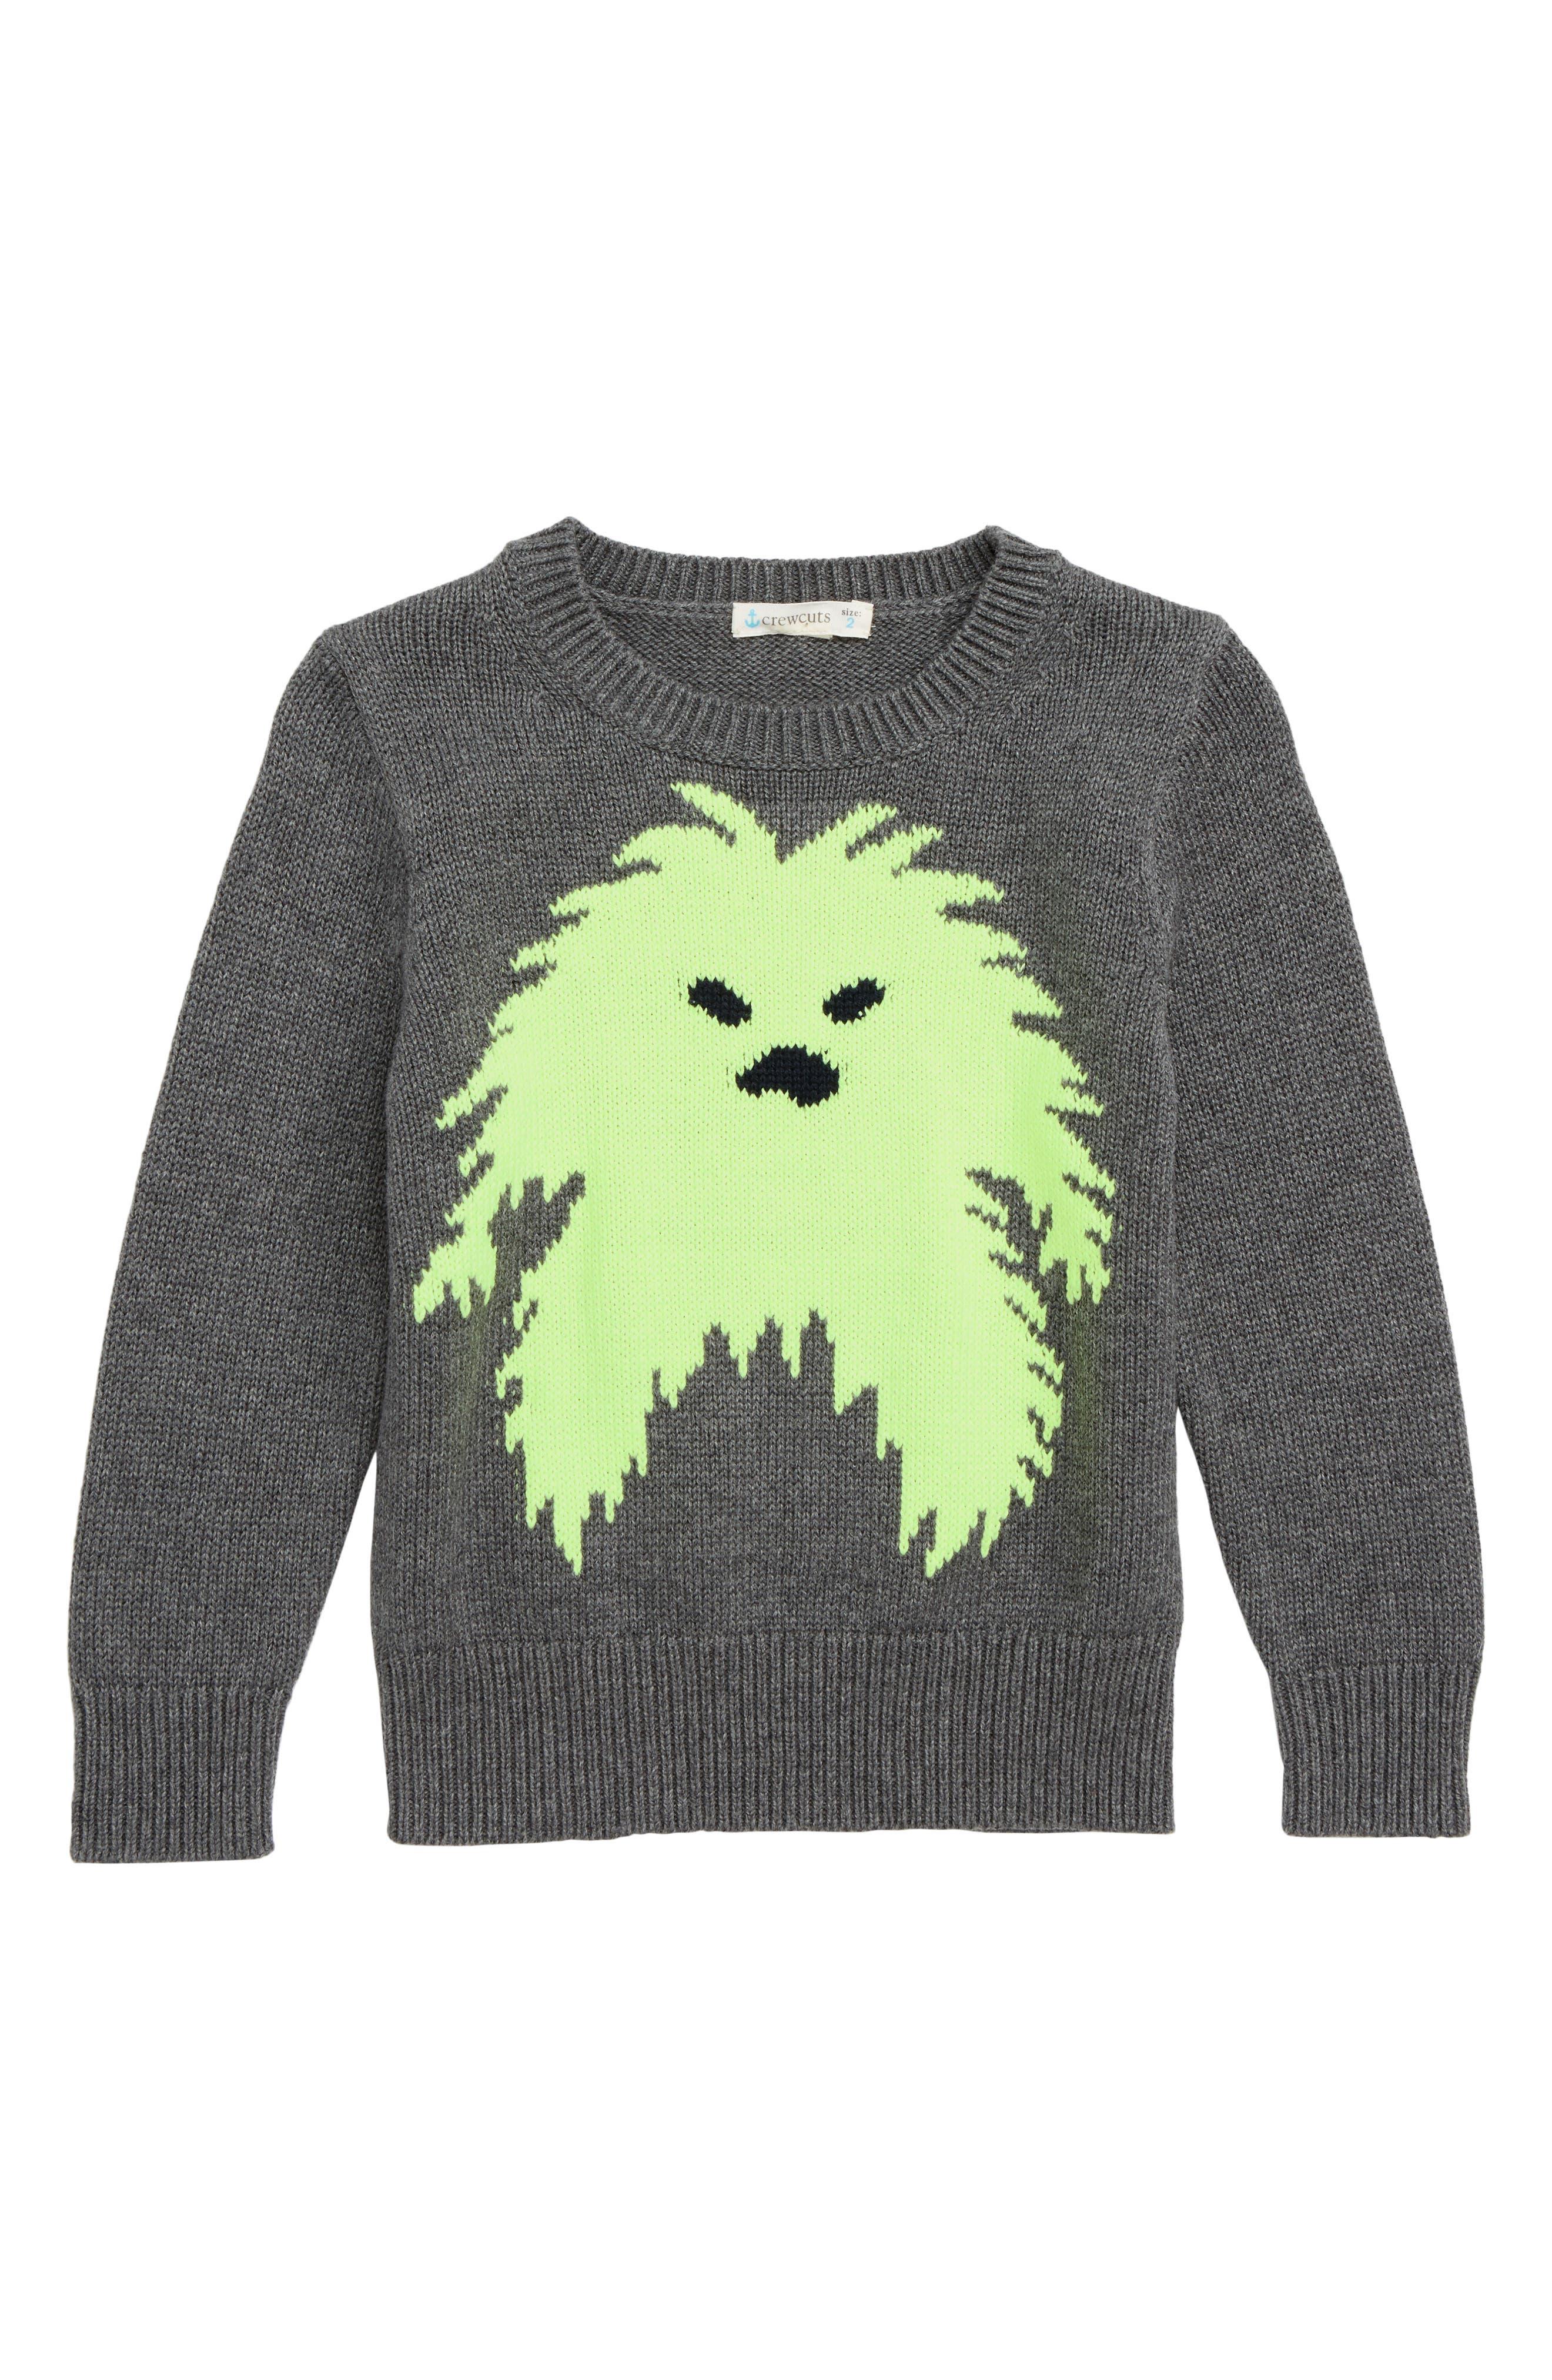 CREWCUTS BY J.CREW,                             Yeti Sweater,                             Main thumbnail 1, color,                             NEON GREEN